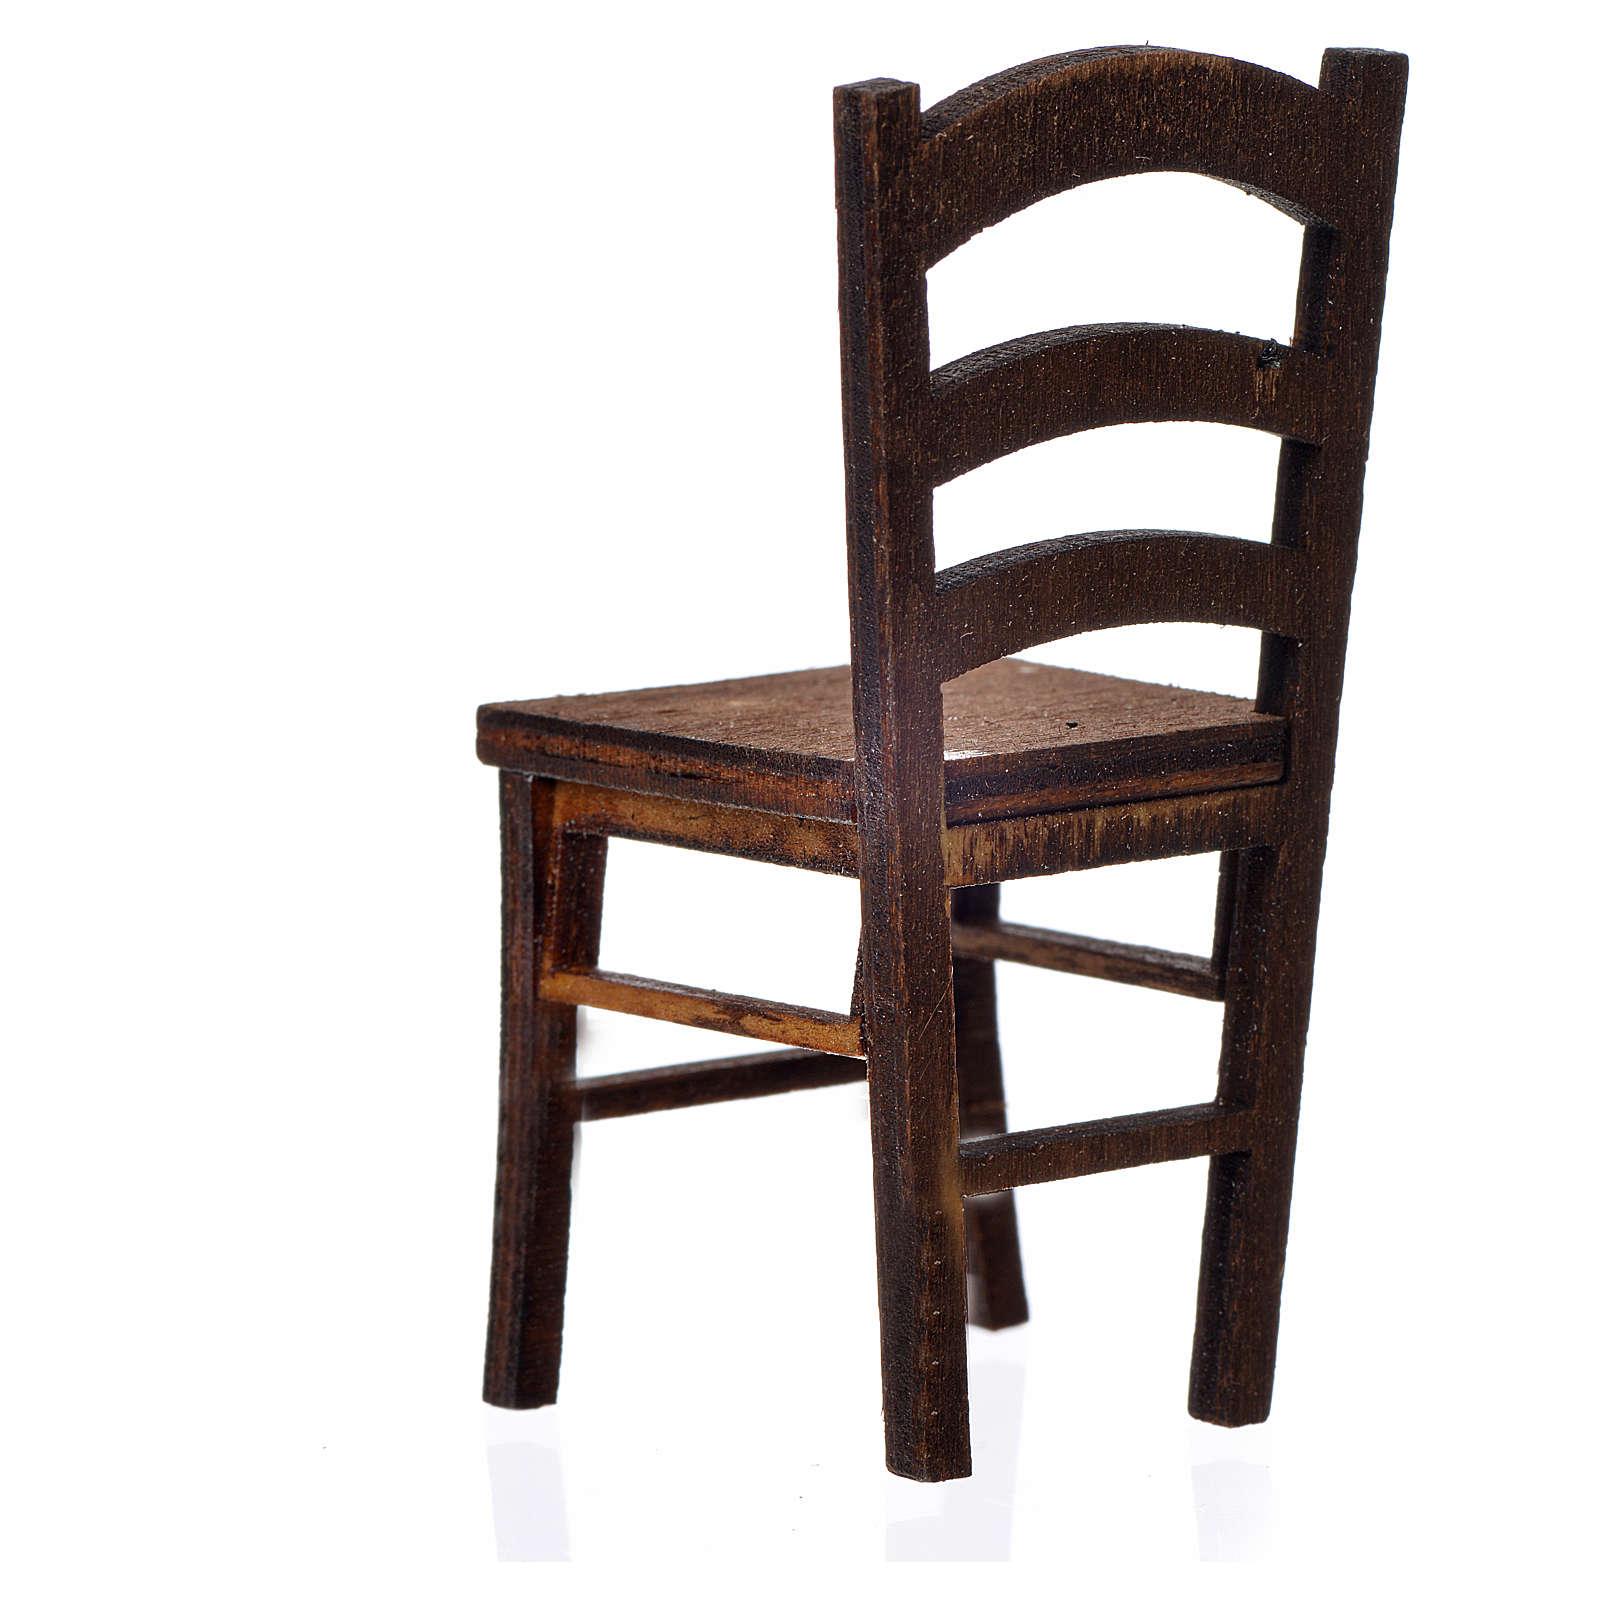 Chaise en bois en miniature 6,5x3x3 4